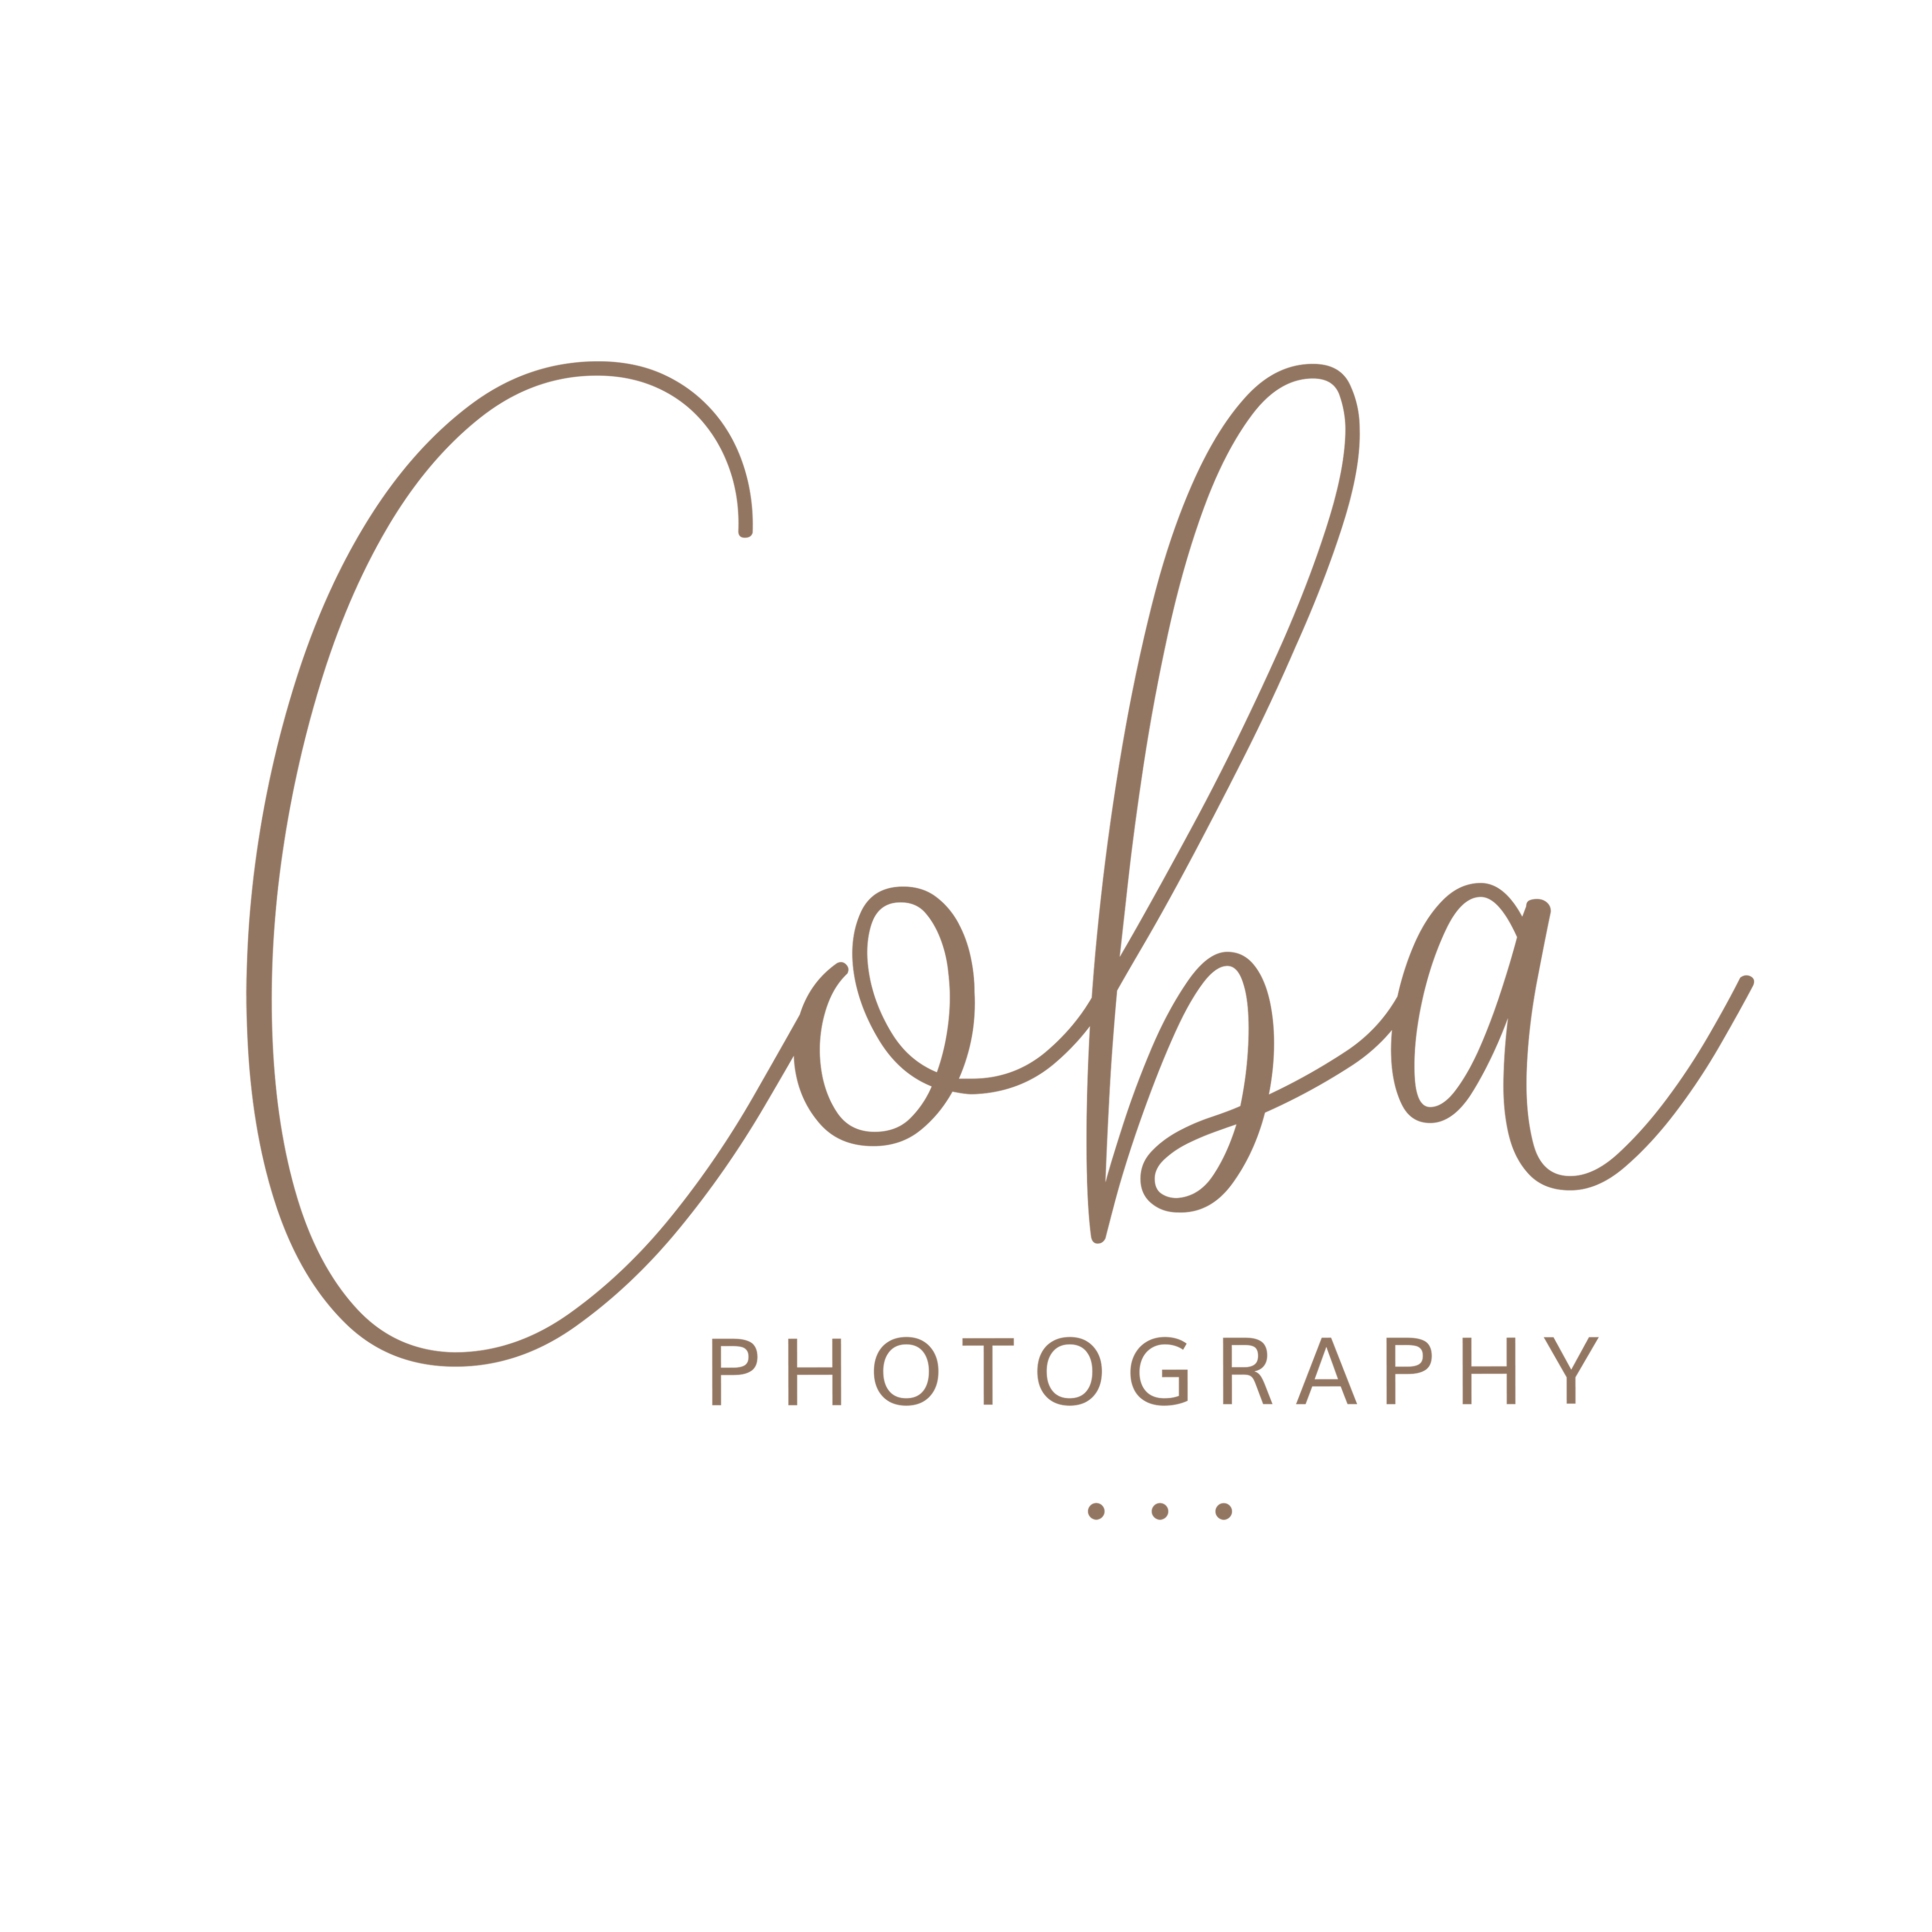 Coba Photography